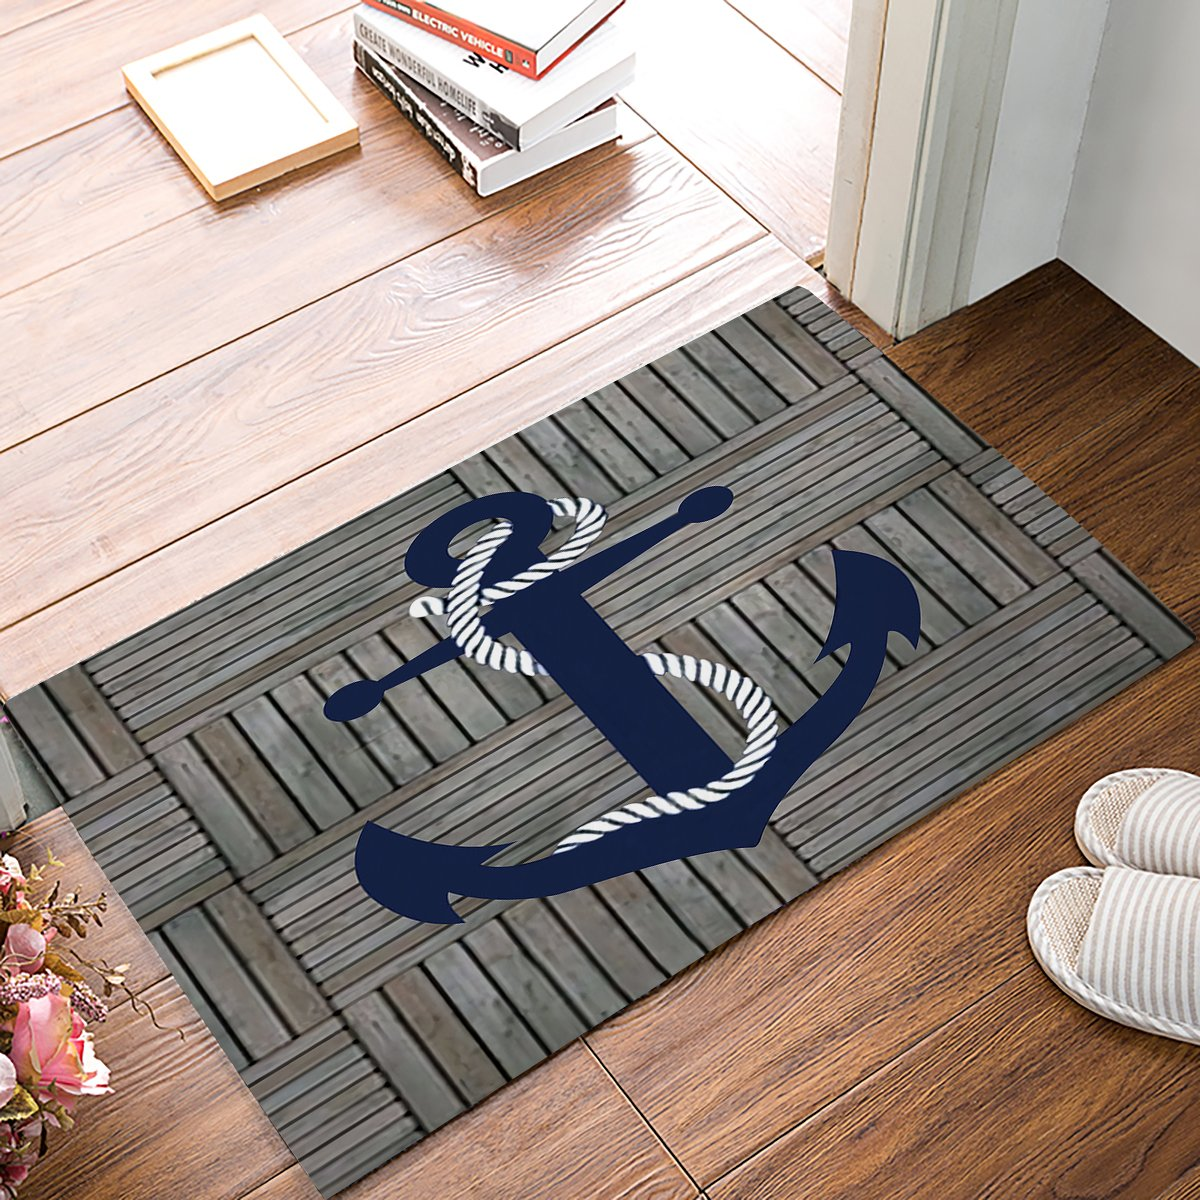 Nautical Anchor Custom Door Mat, Vintage Wood Rustic Indoor Outdoor Non-slip Rubber Entrance Rugs for Bathroom/Front